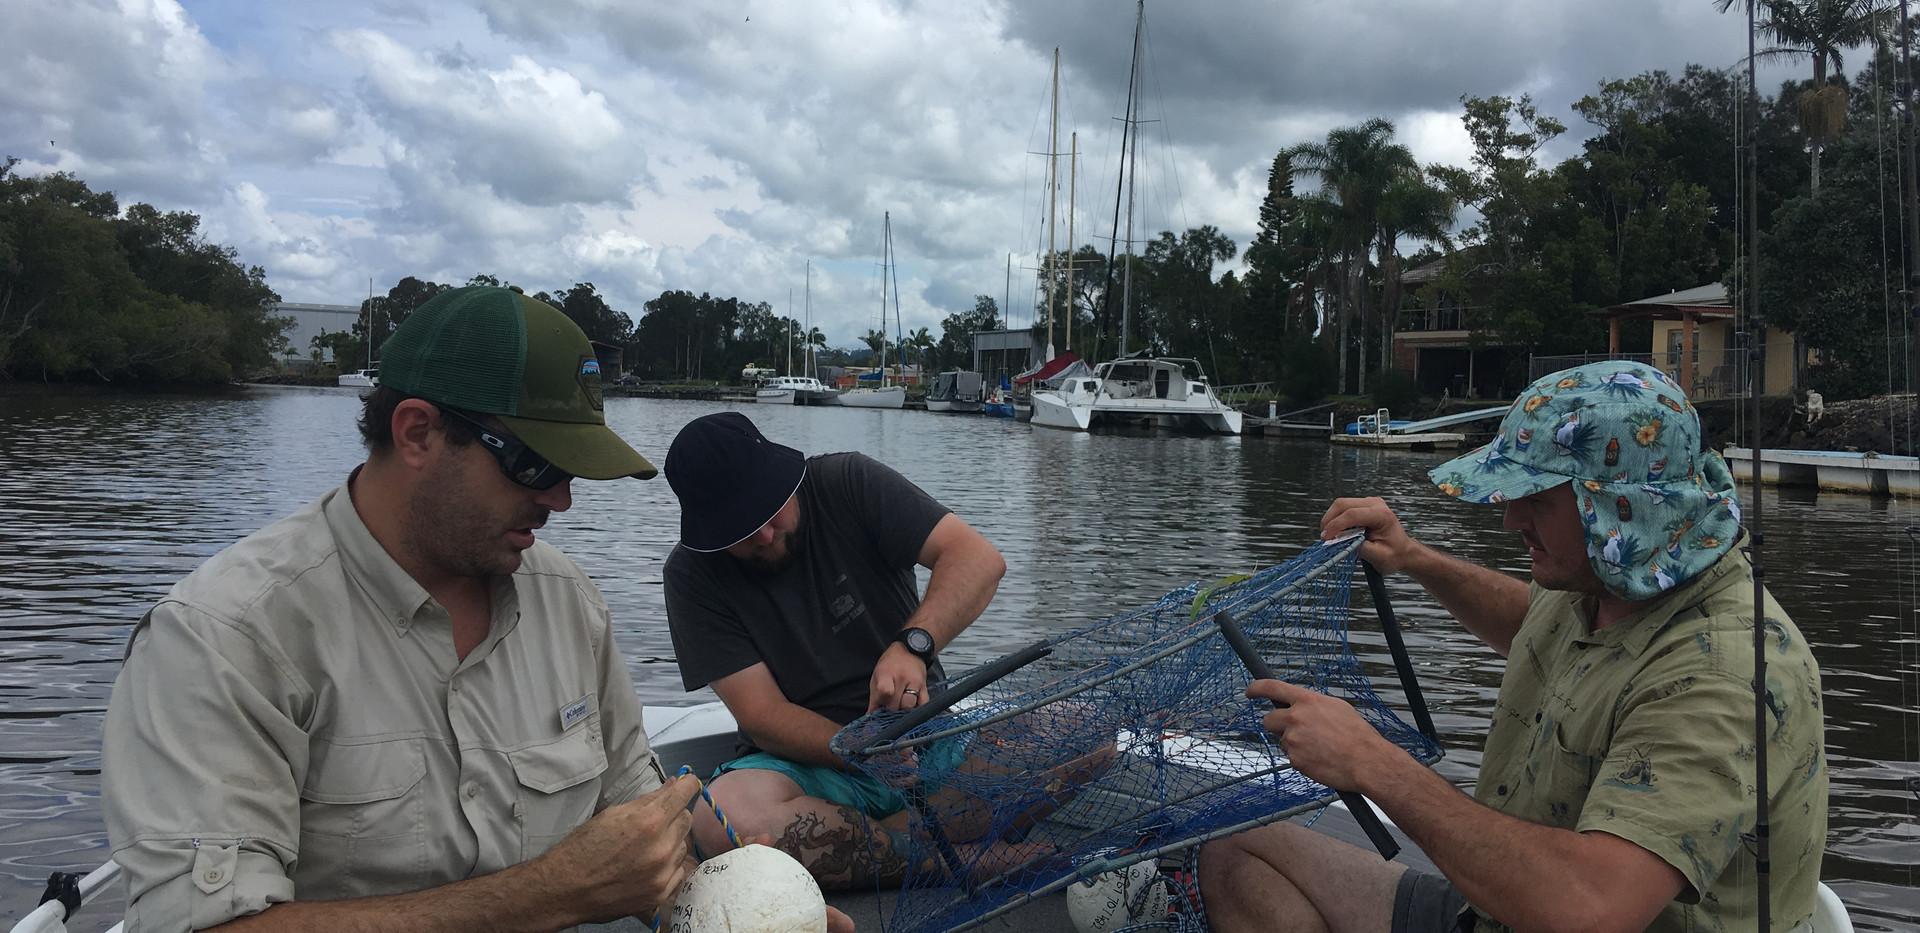 Catching crabs